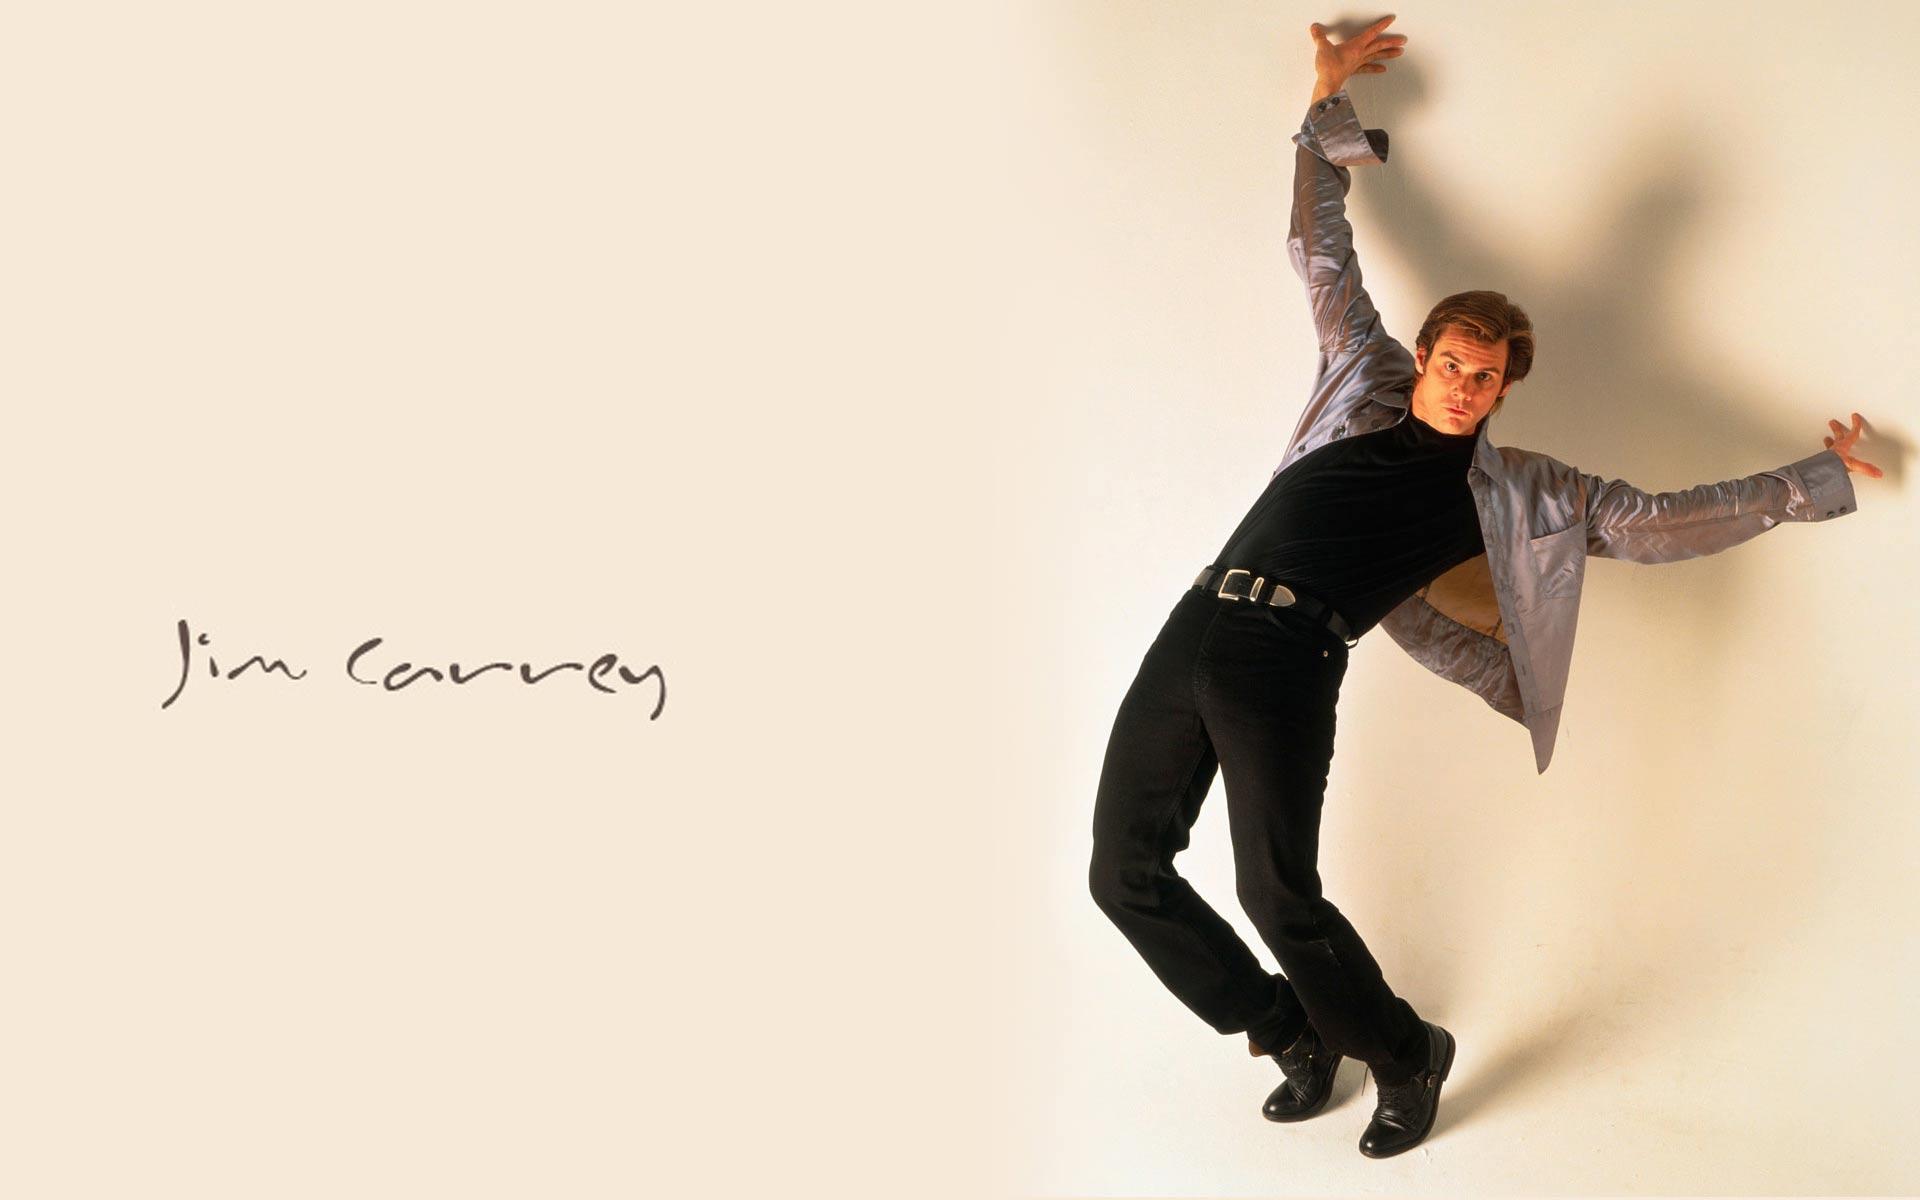 Jim Carrey Full Hd